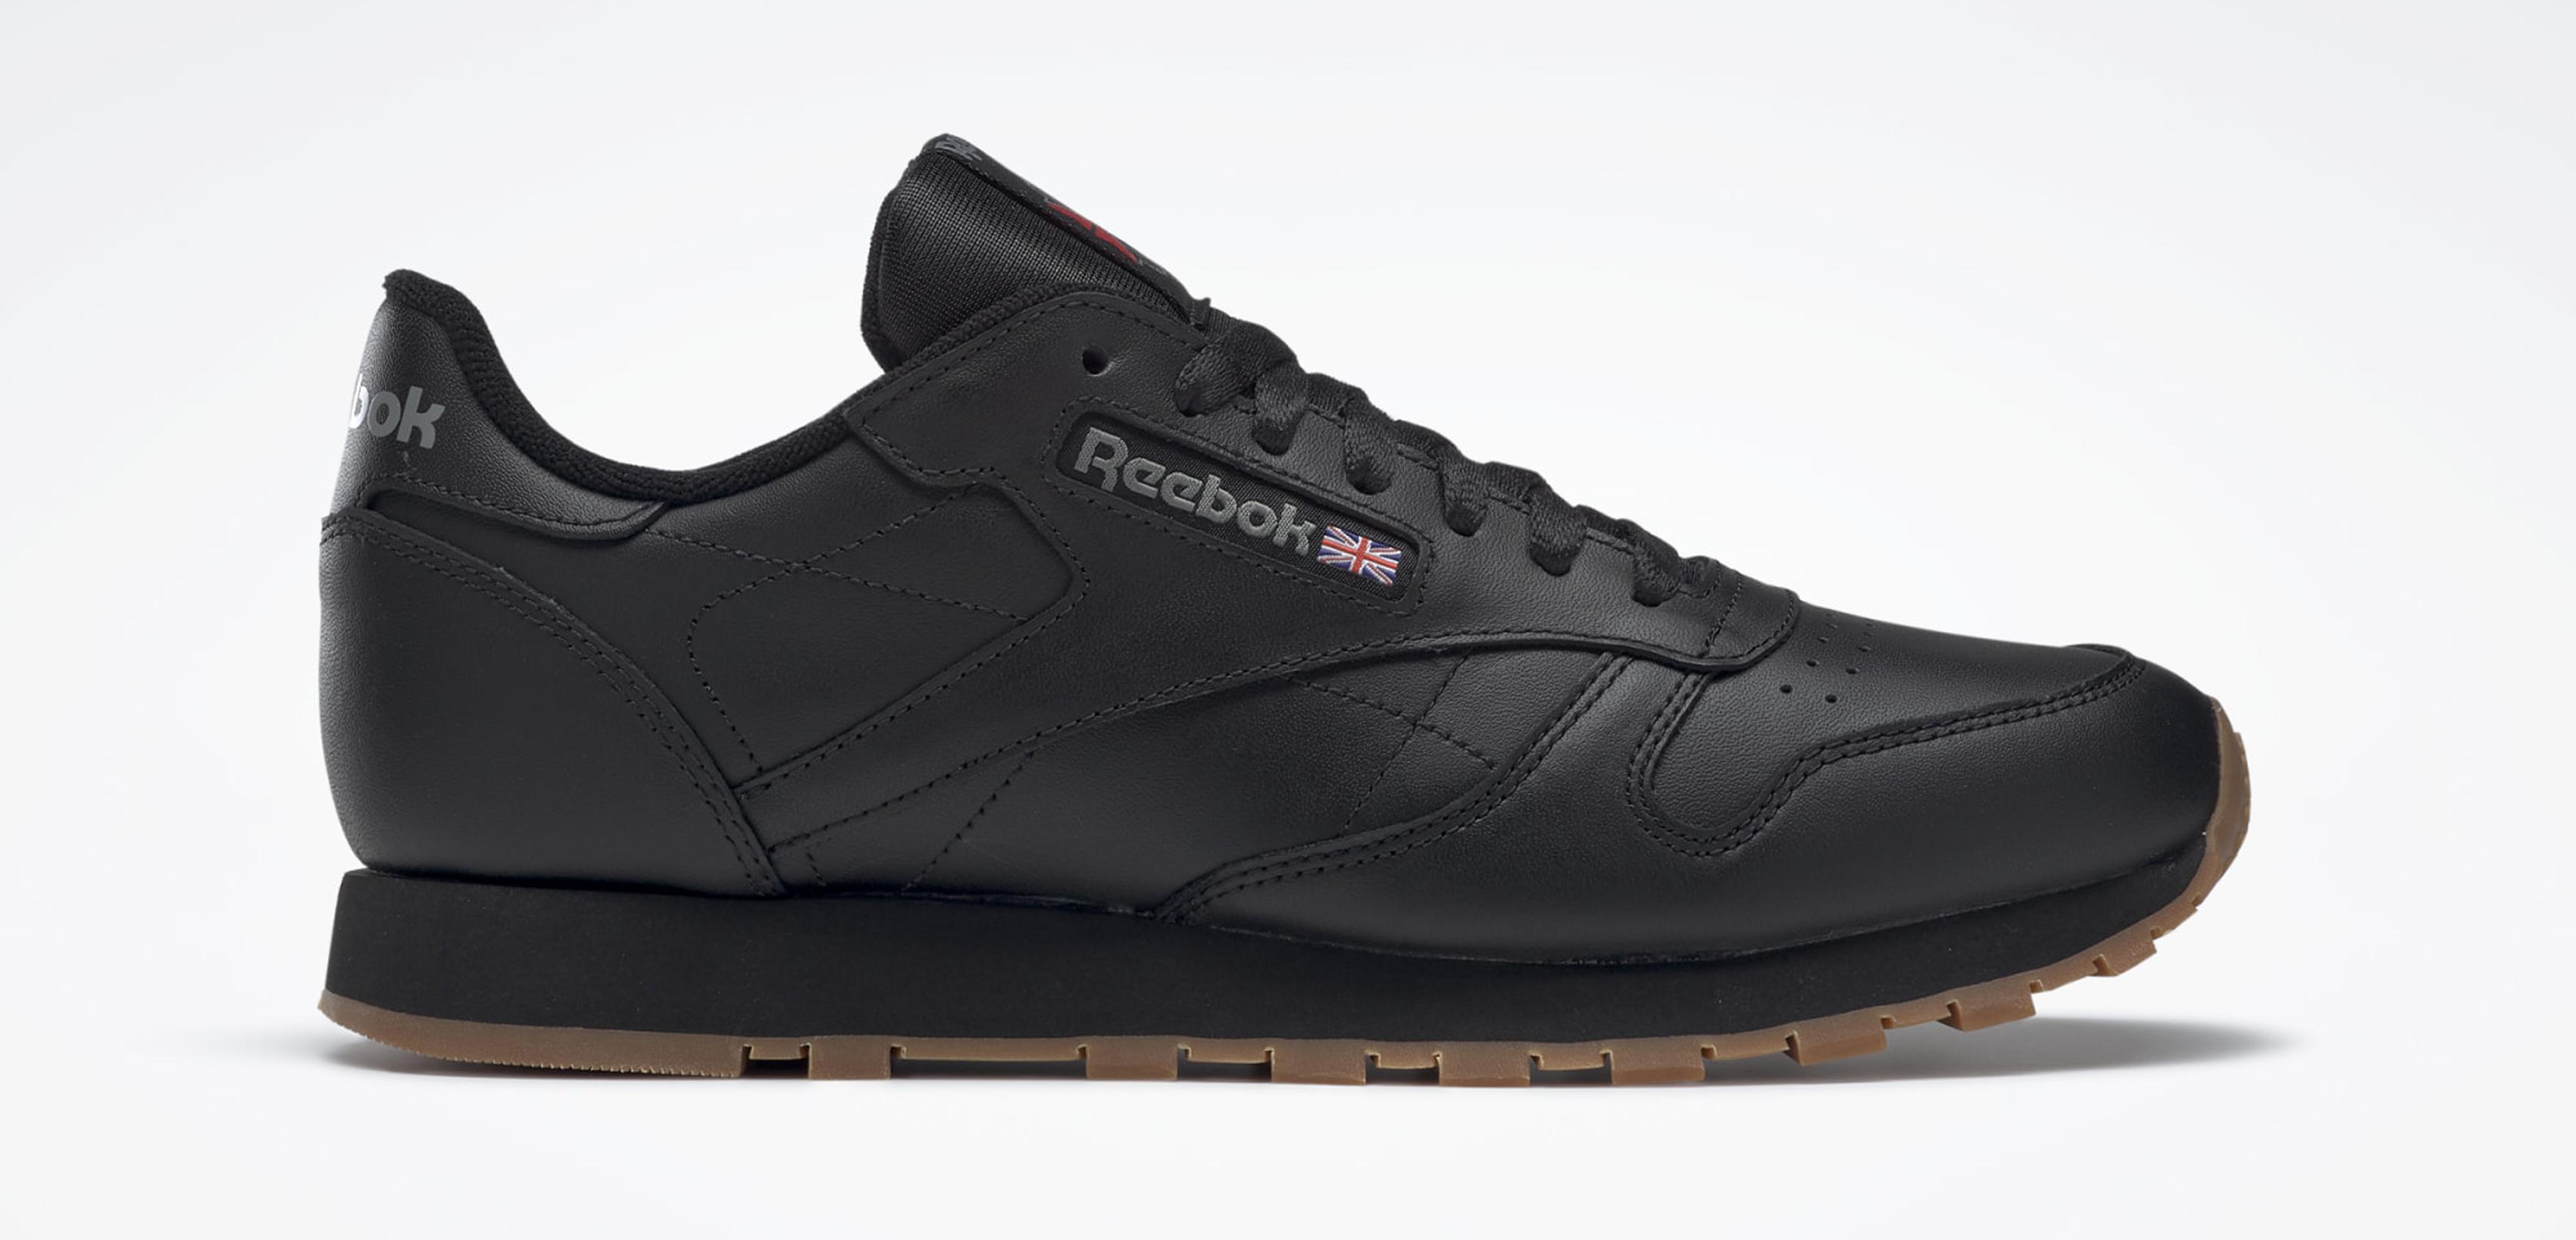 Reebok Classic Leather Shoes Intense Black/Gum